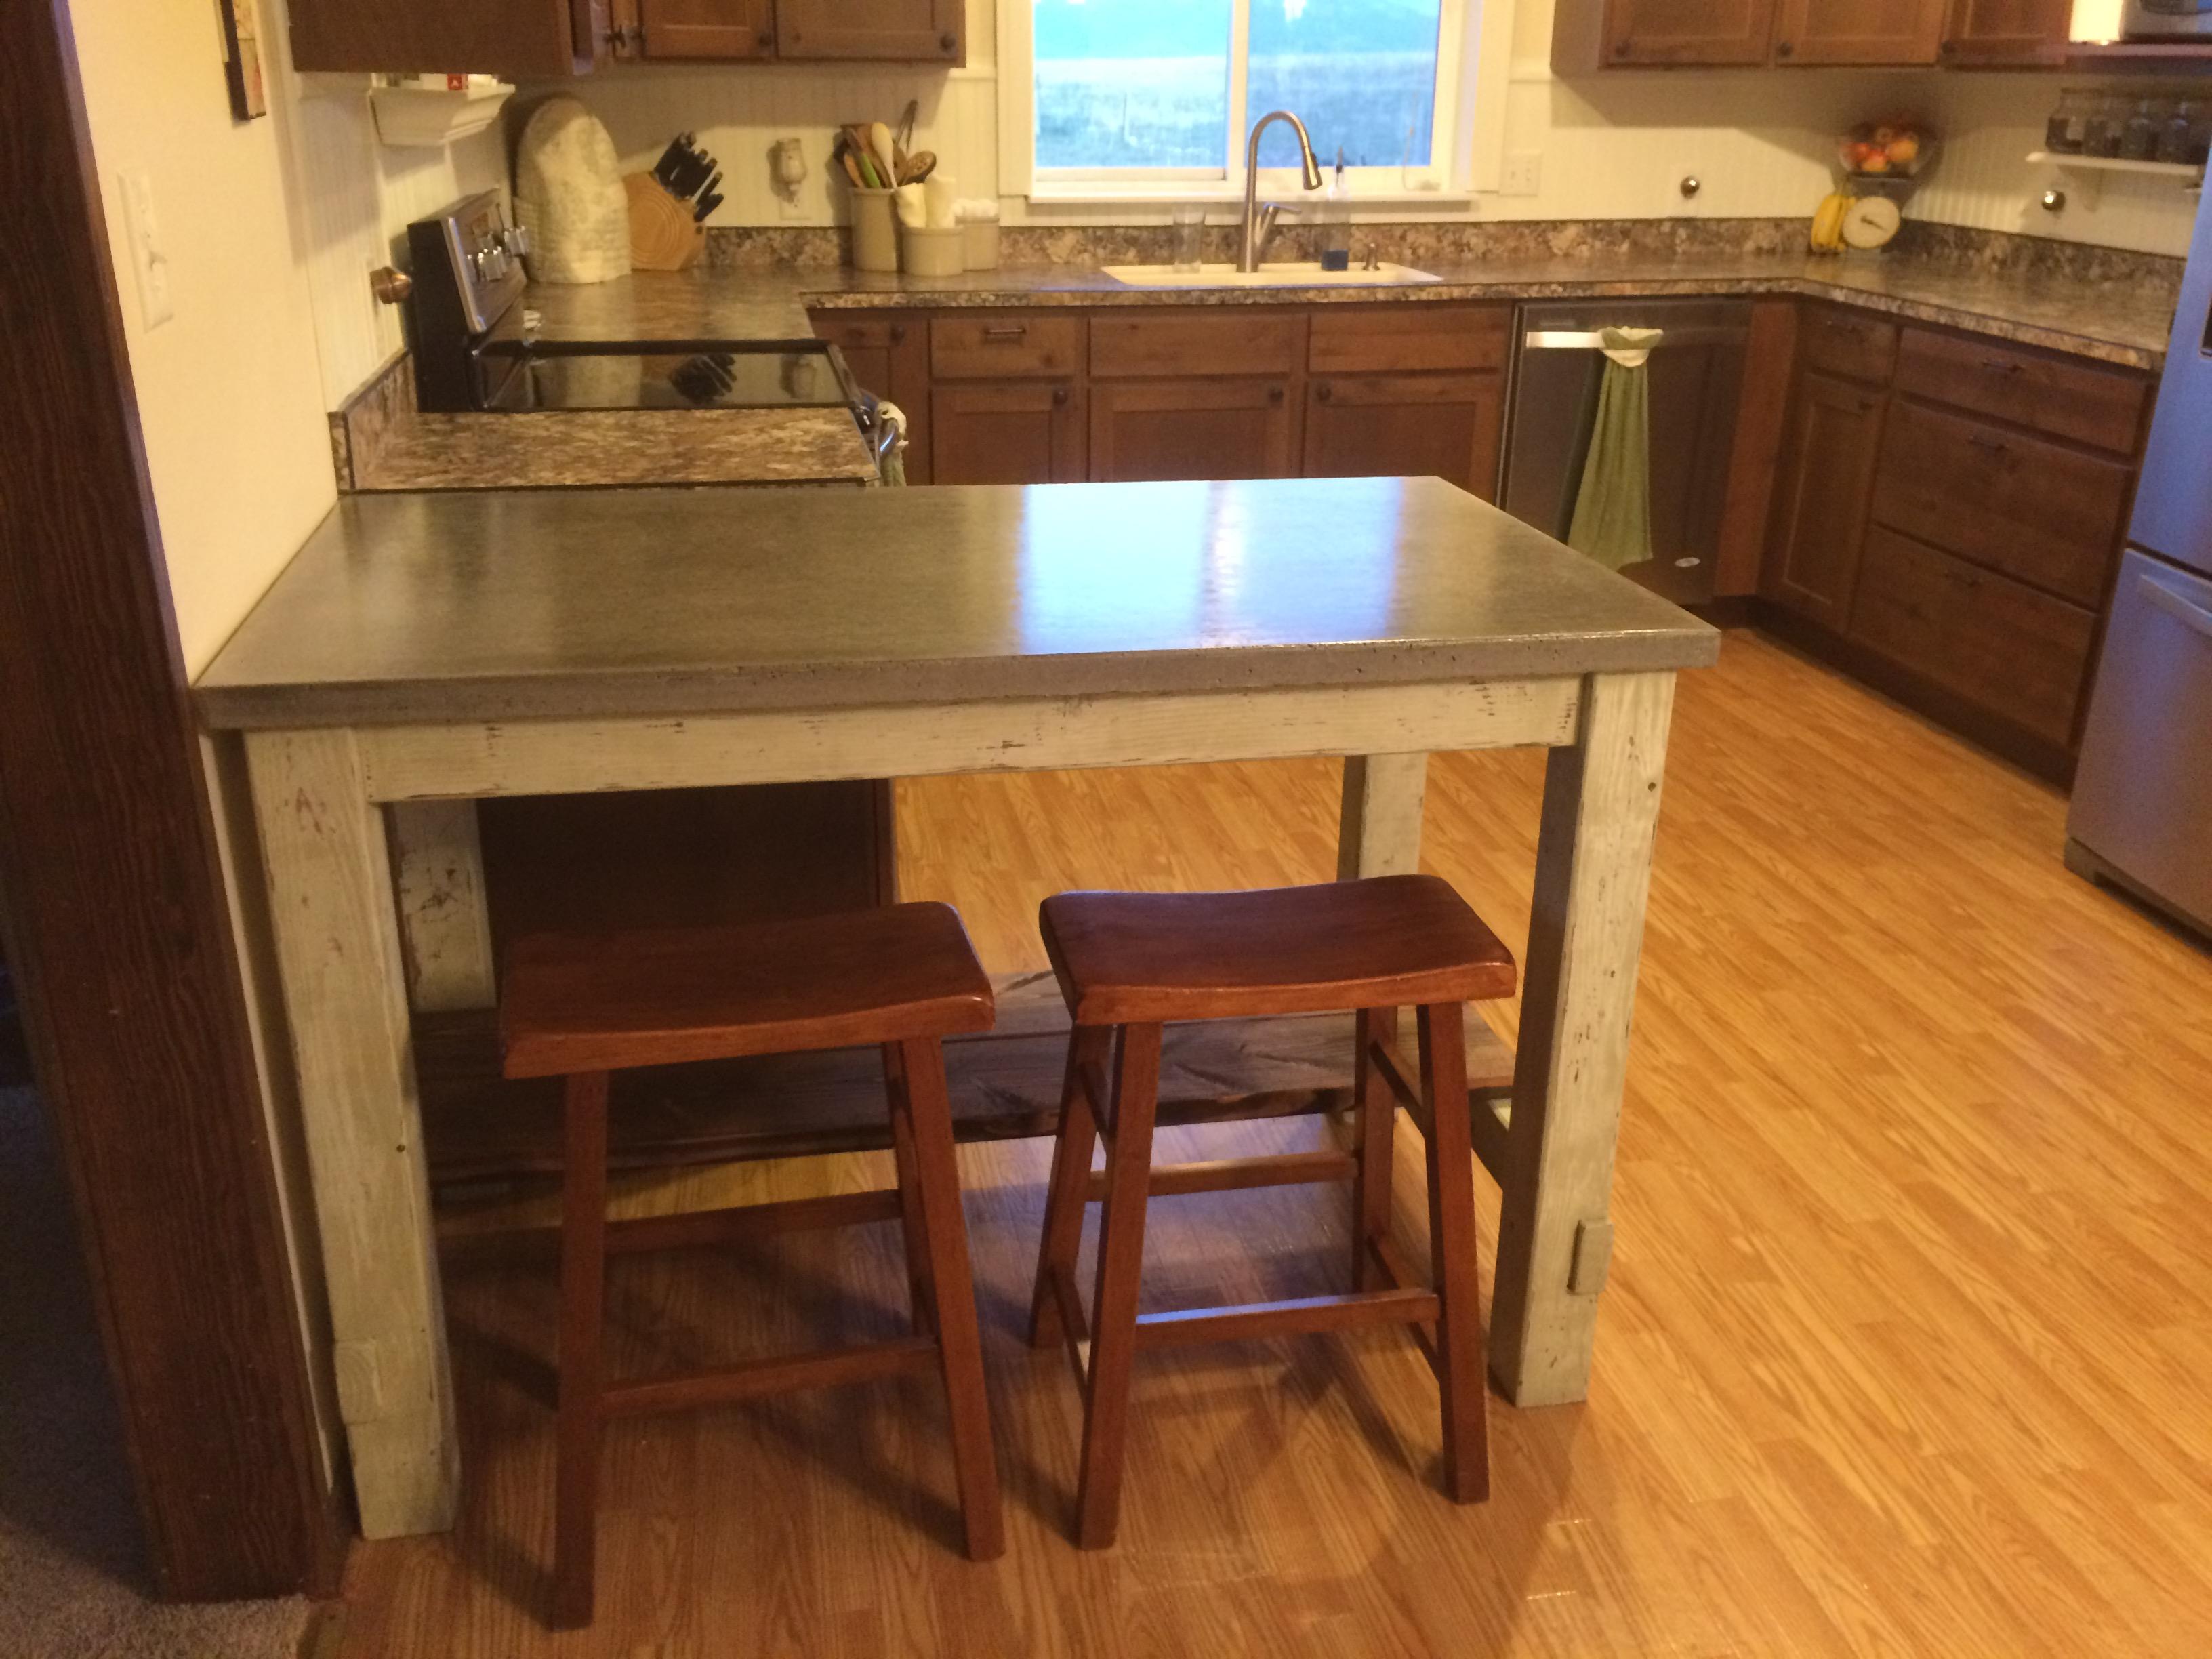 Kitchen Island with Concrete Countertop | Ana White